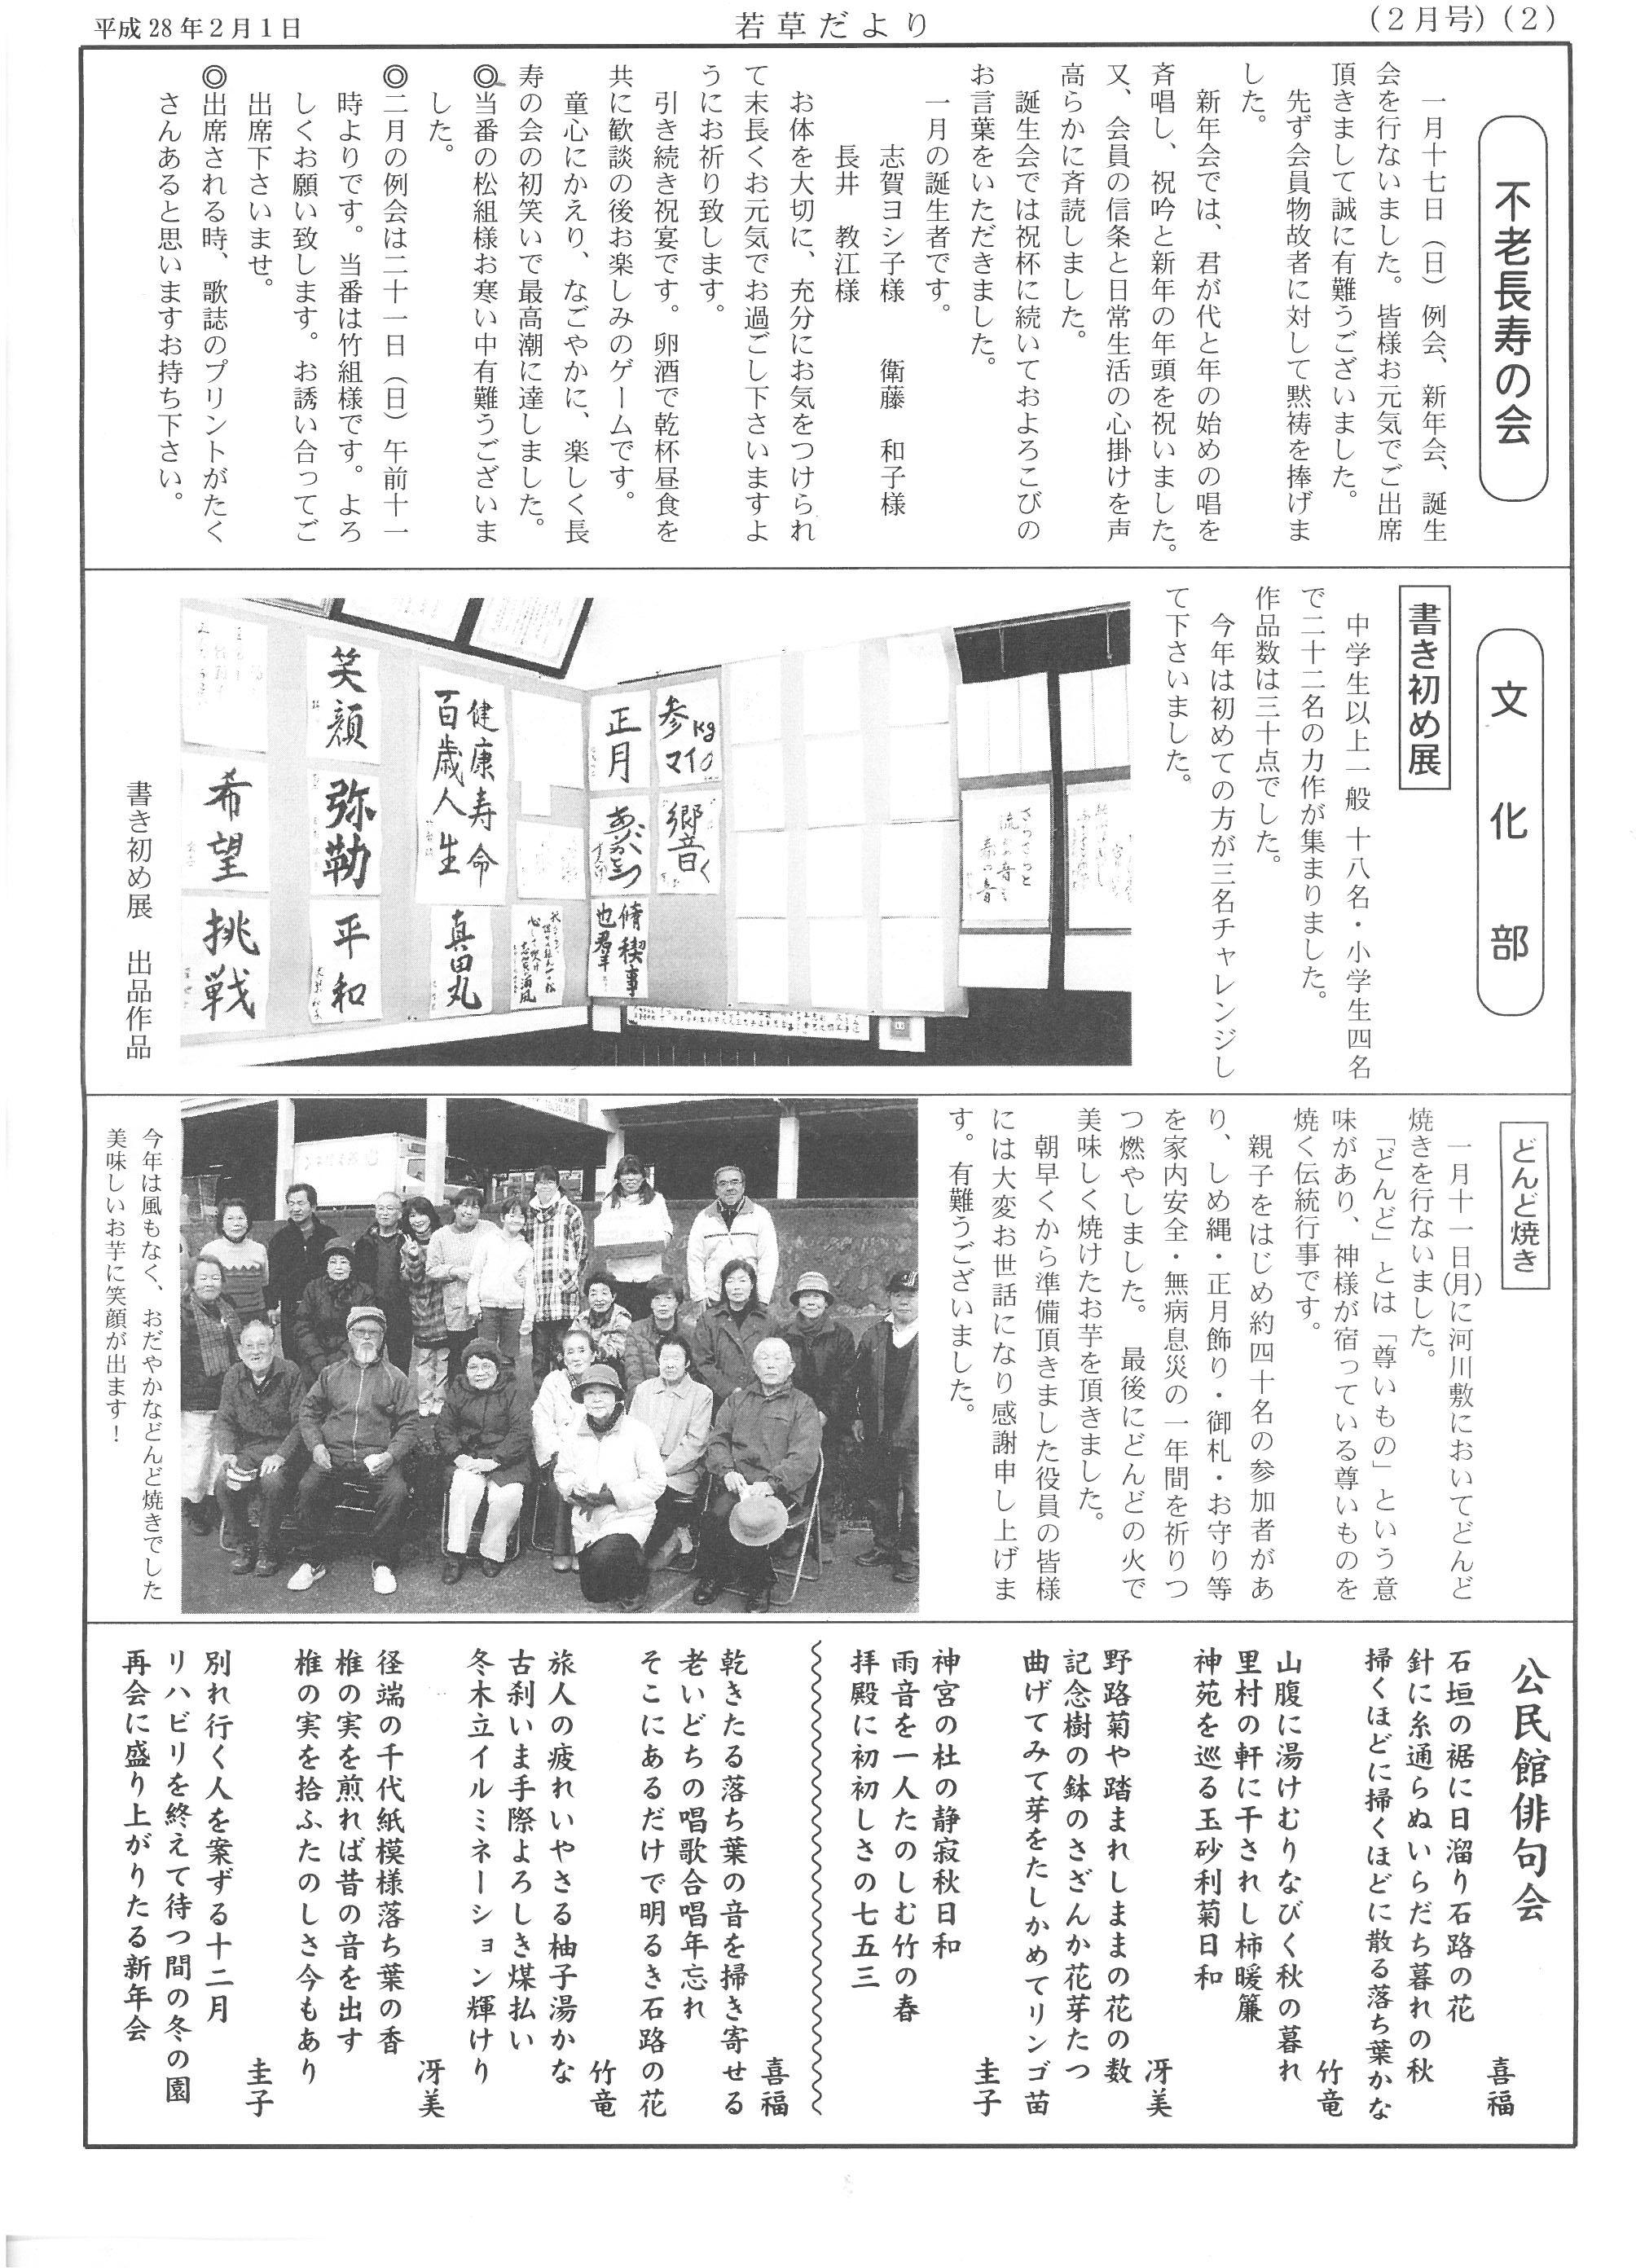 wakakuswa2016_02_02